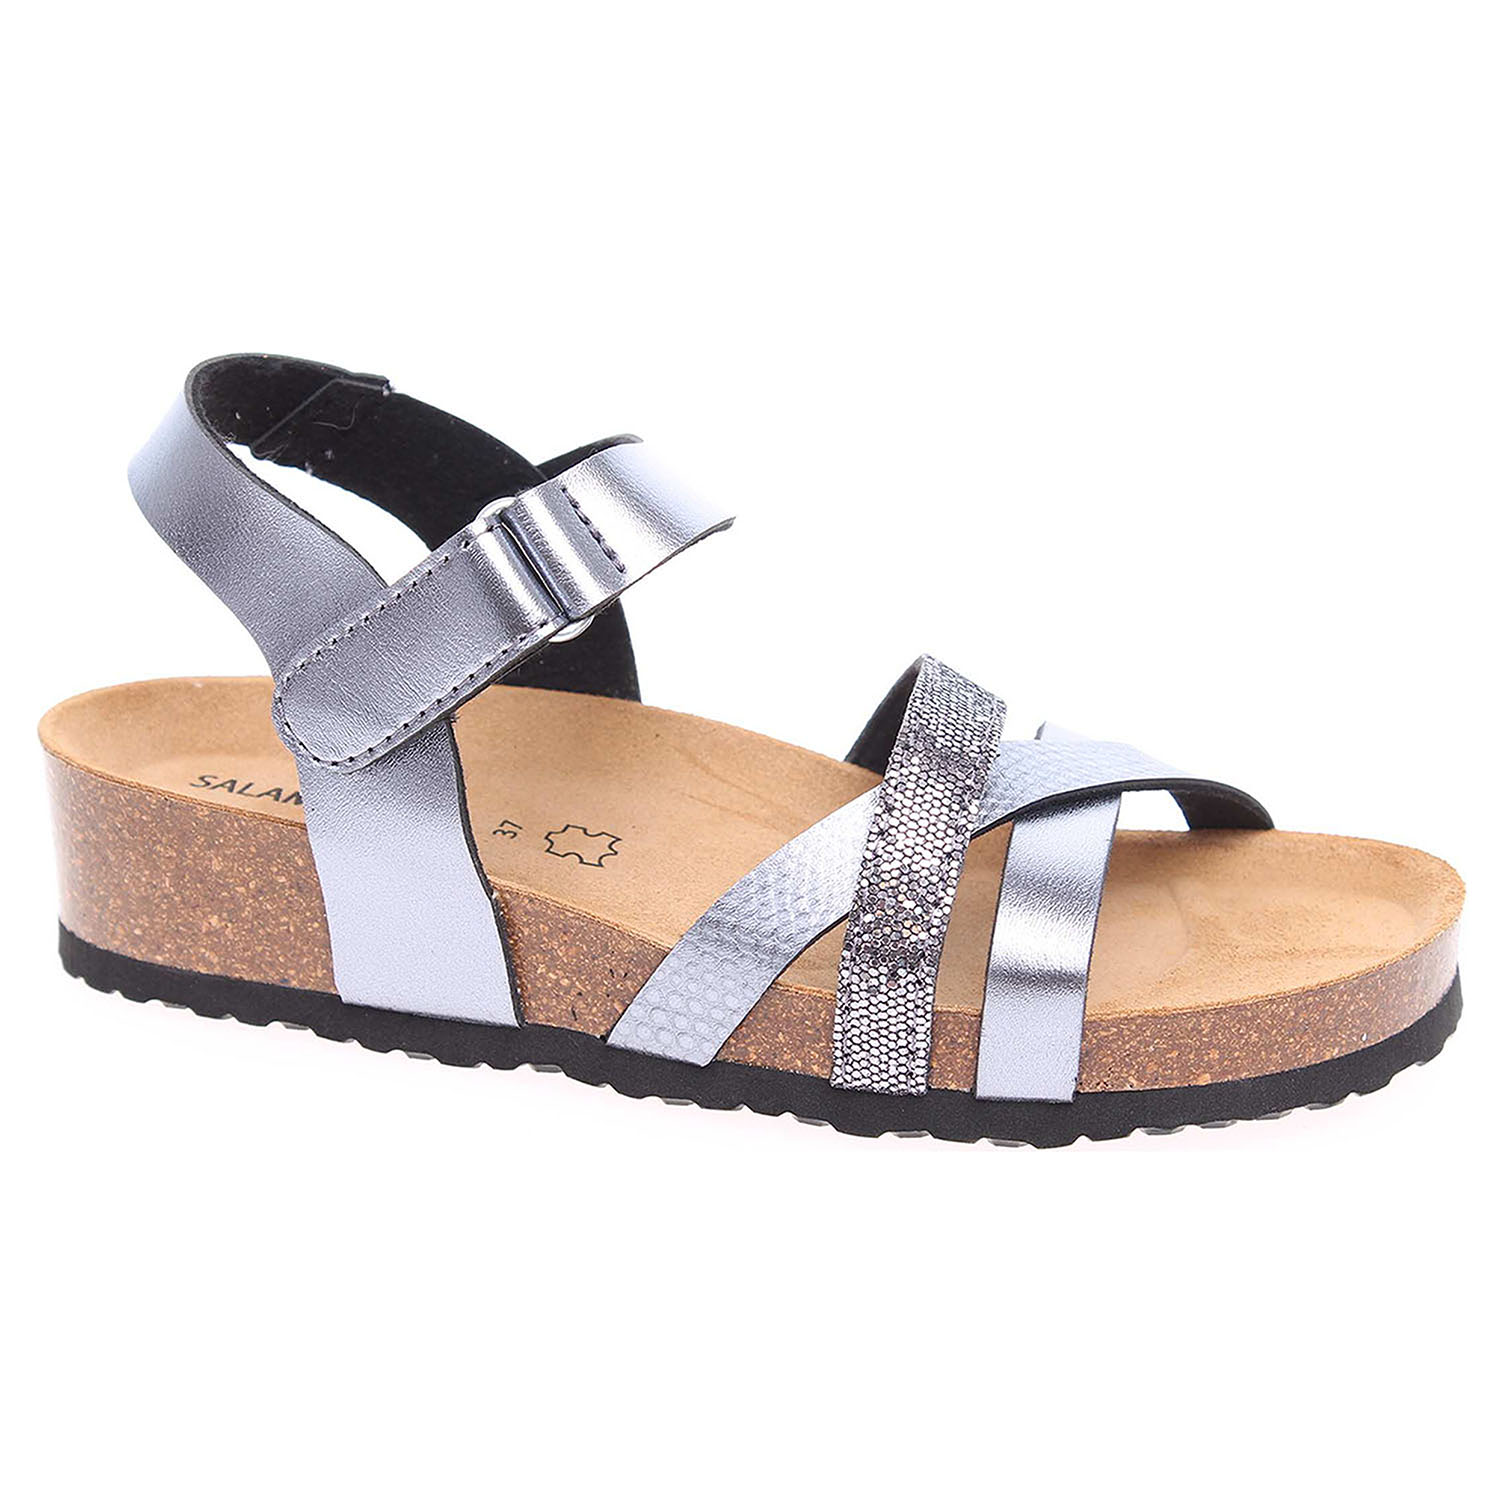 28d9414f1644 Ecco Dámské sandály Salamander 32-13103-35 anthrazit 23801264